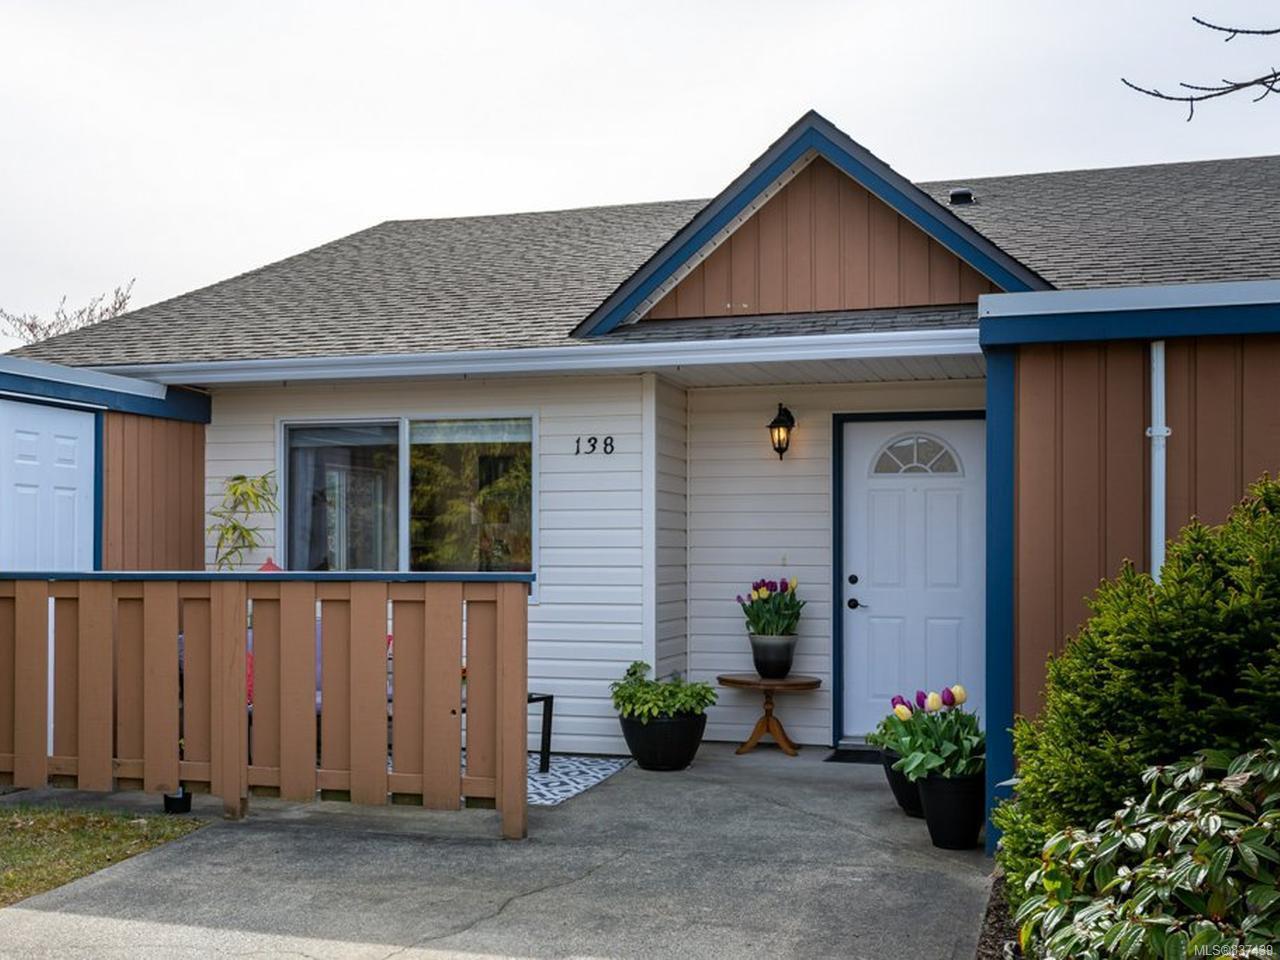 Main Photo: 138 2191 Murrelet Dr in COMOX: CV Comox (Town of) Row/Townhouse for sale (Comox Valley)  : MLS®# 837439